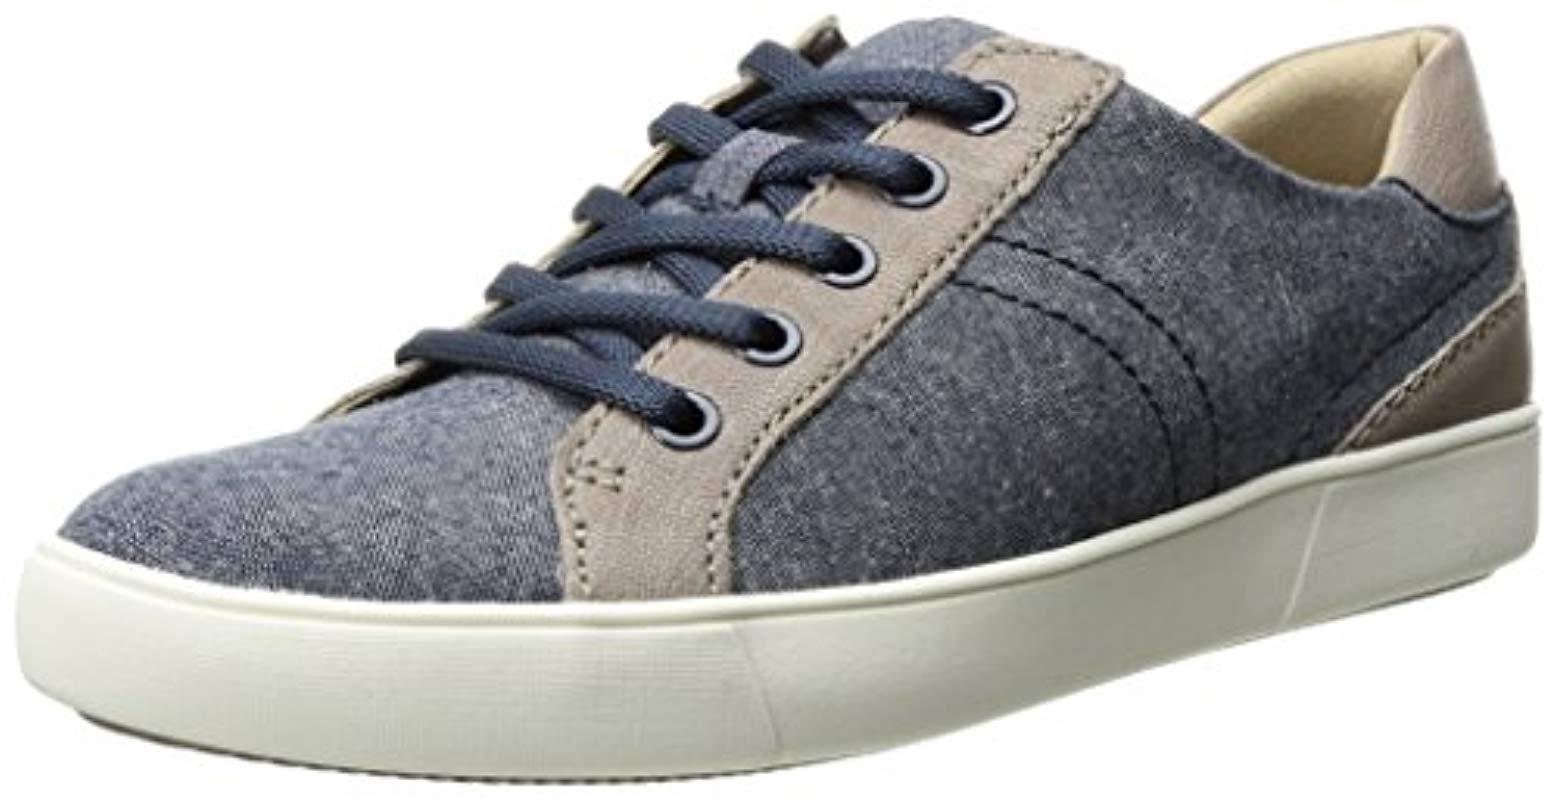 73289ba049c46 Lyst - Naturalizer Morrison Fashion Sneaker in Blue